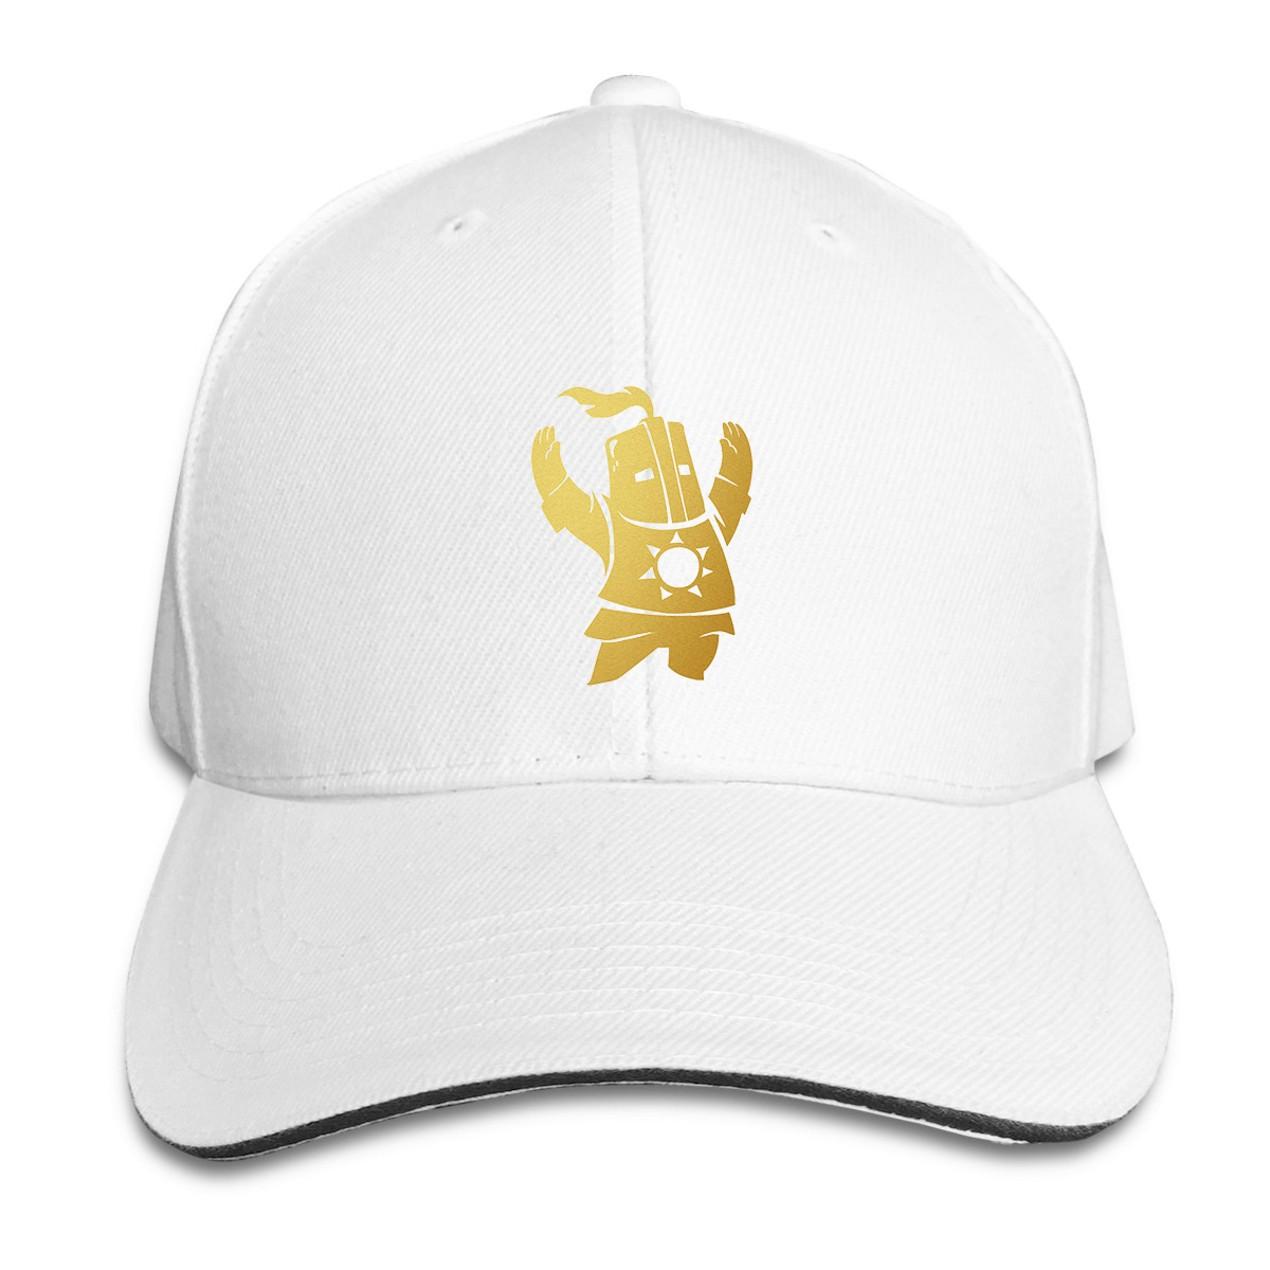 Dark Souls Sunbro Praise the Sun Snapback Baseball Caps Hat - Tanga c104780482e